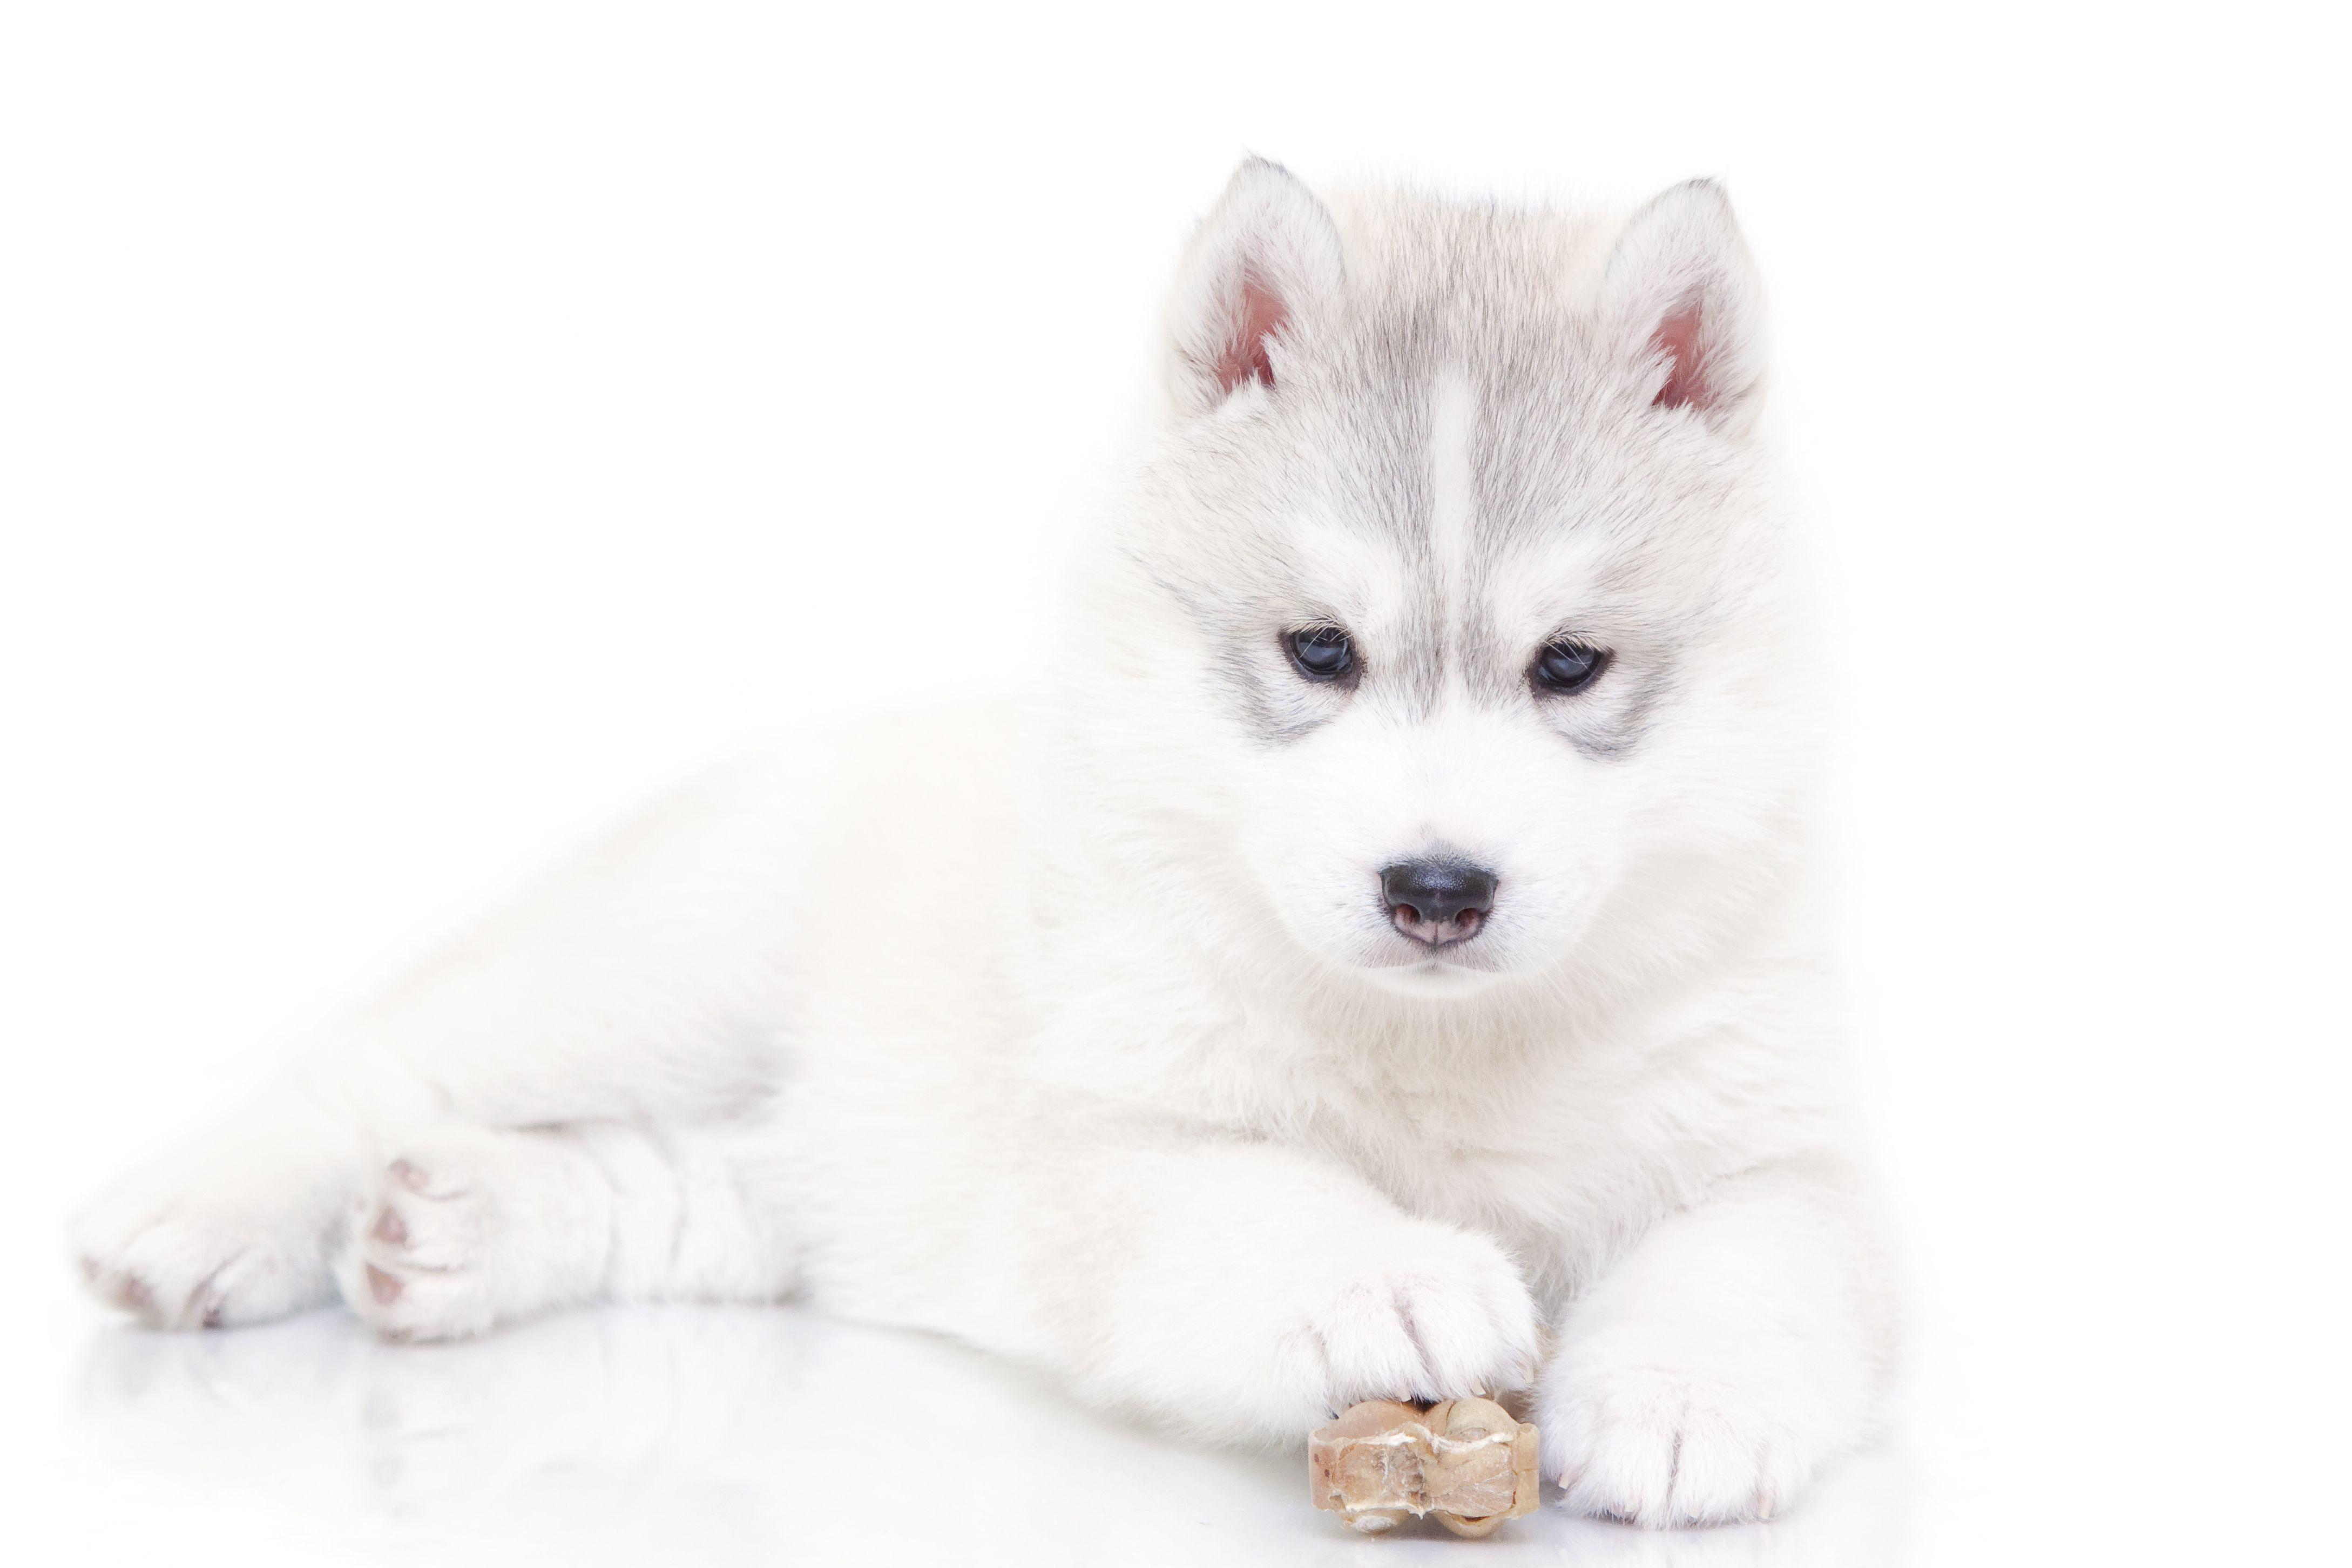 Siberian Husky Puppy Friendship Puppy Dog Pets Puppies